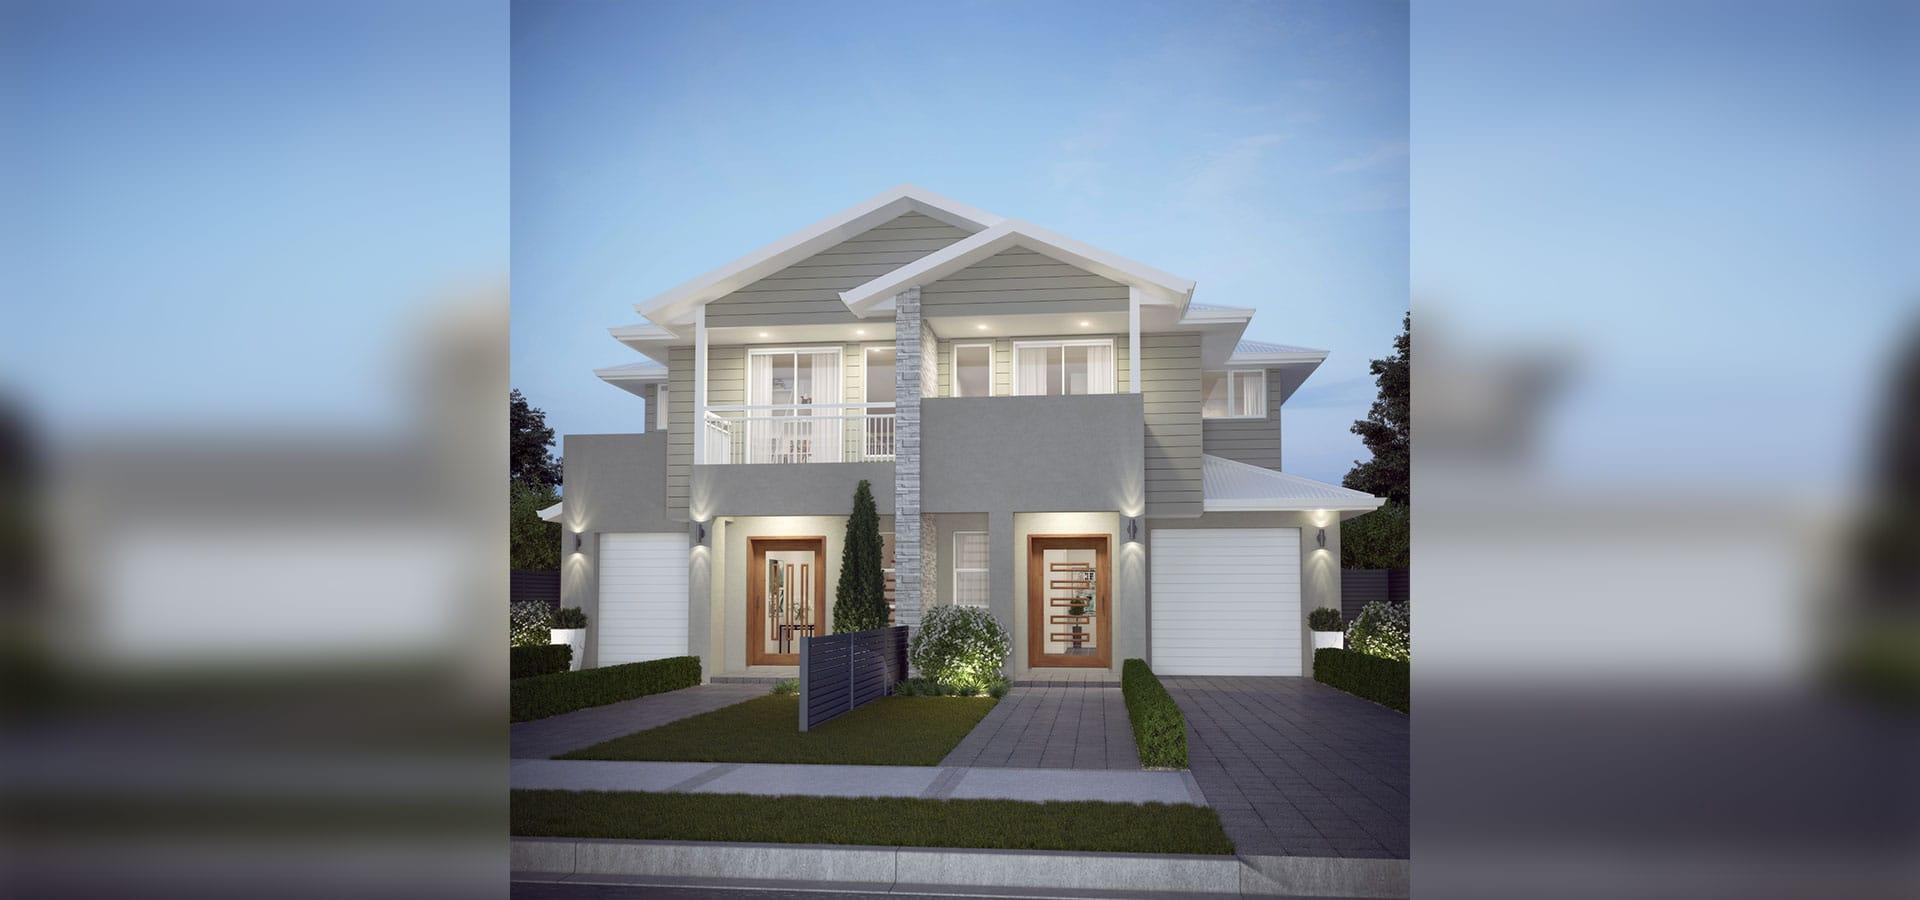 Sweetpea-Duplex-House-Design updated